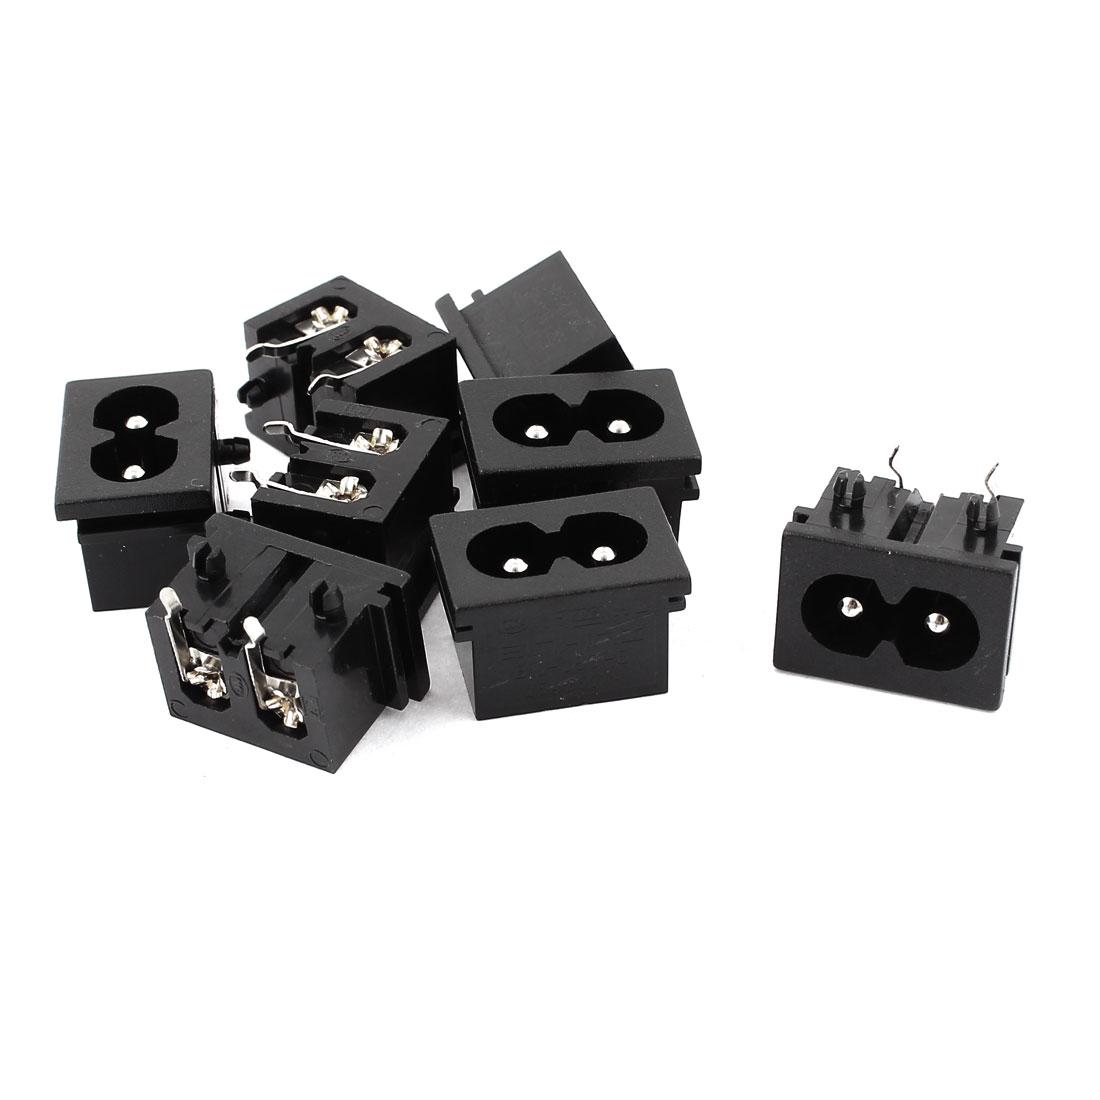 AC 250V 2.5A IEC320 C8 Male PCB Mount Inlet Power Socket Black 8Pcs